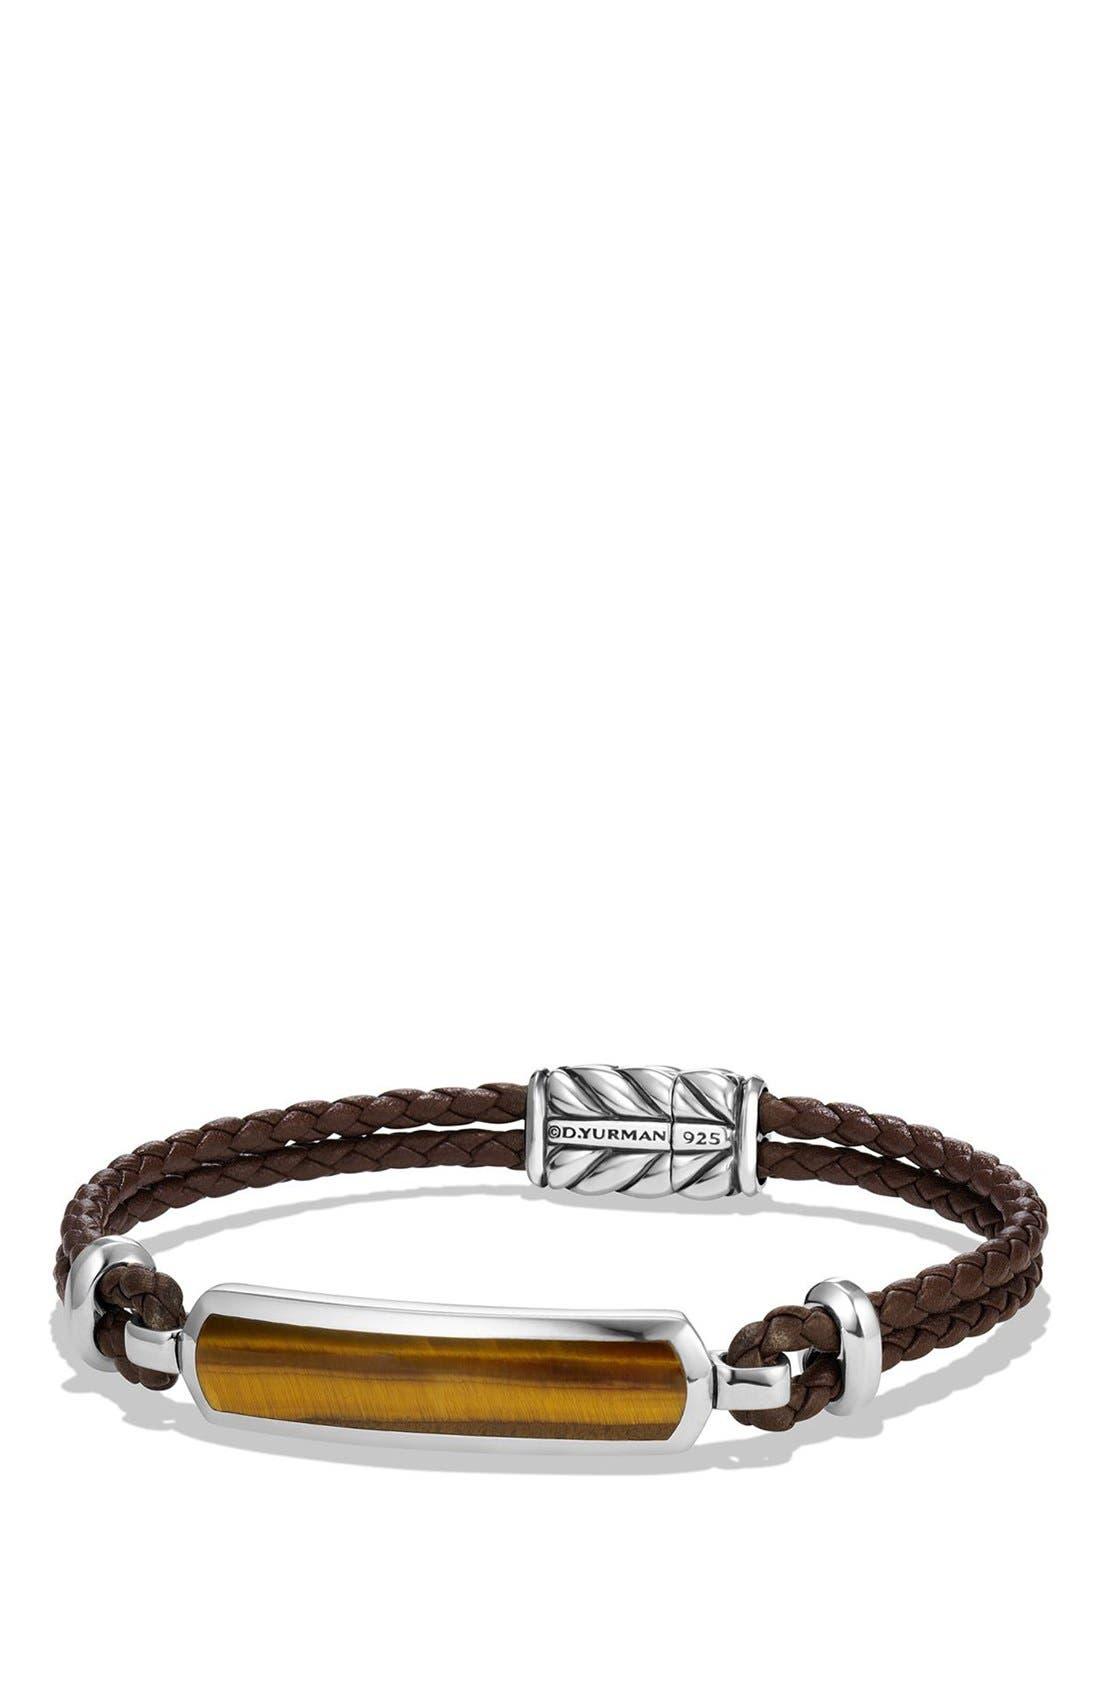 DAVID YURMAN Bar Station Leather Bracelet, Main, color, SILVER/ TIGERS EYE